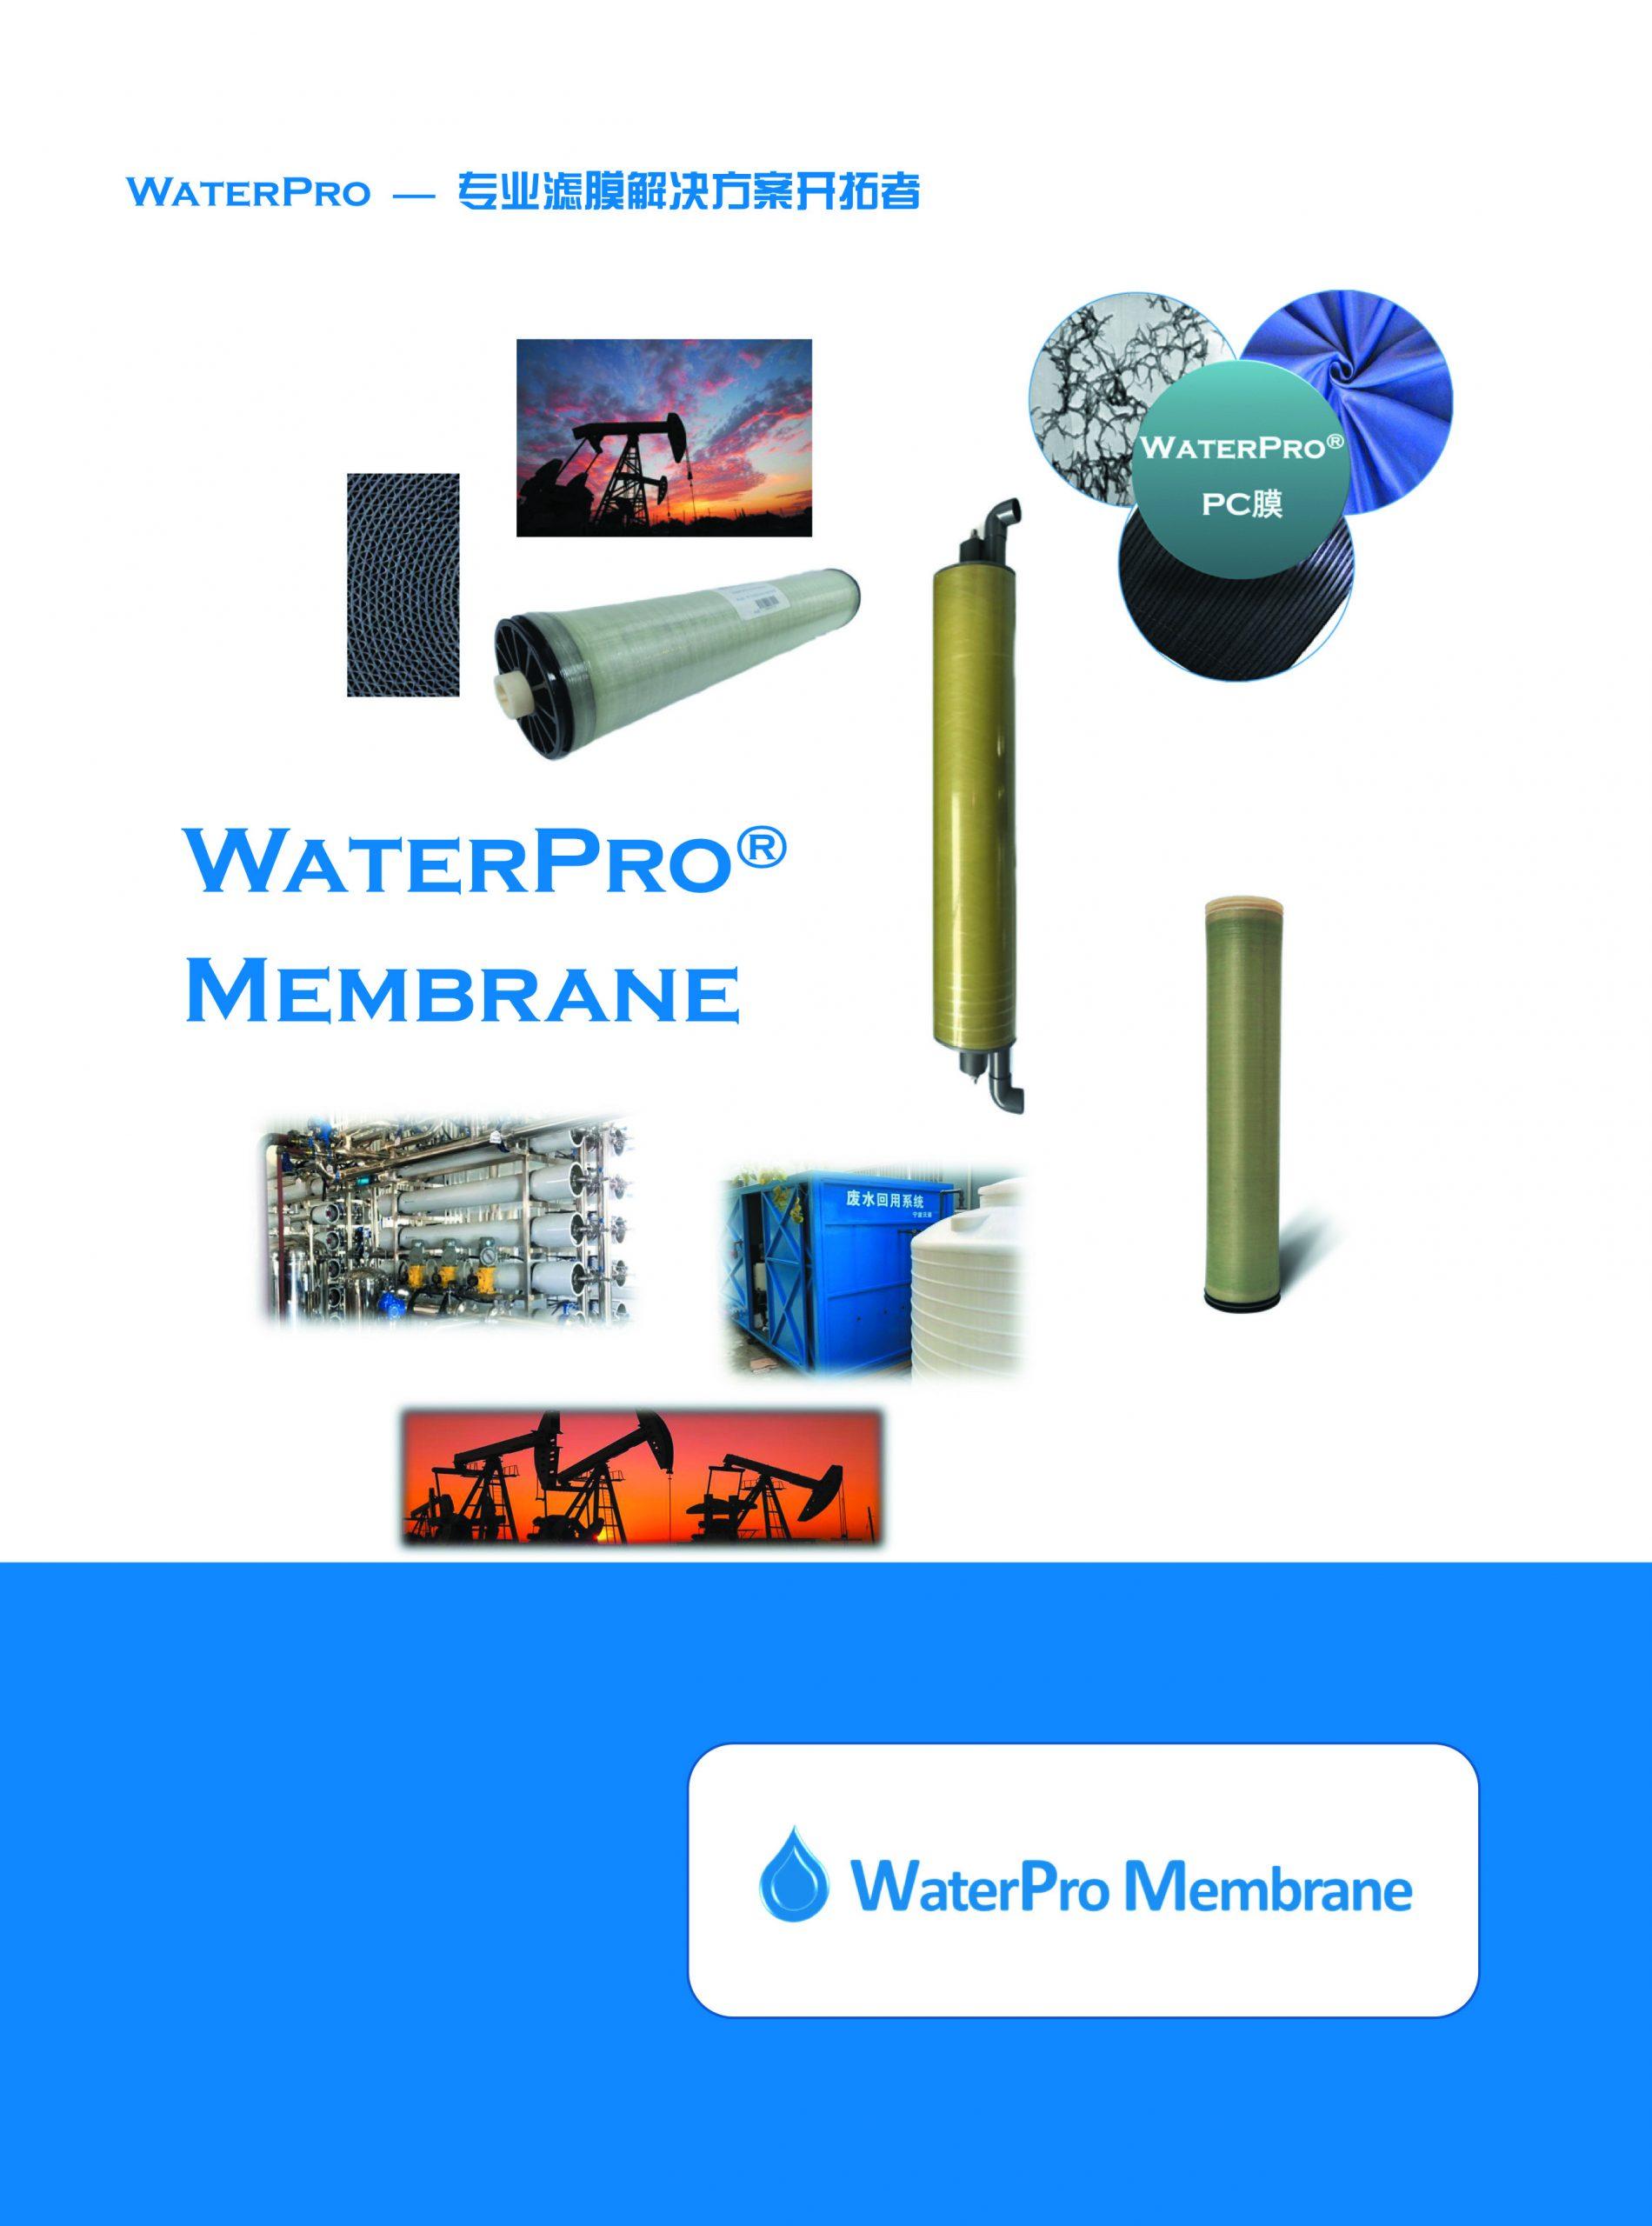 WaterPro 专业滤膜解决方案-PC超滤、GT/ ST/DTRO